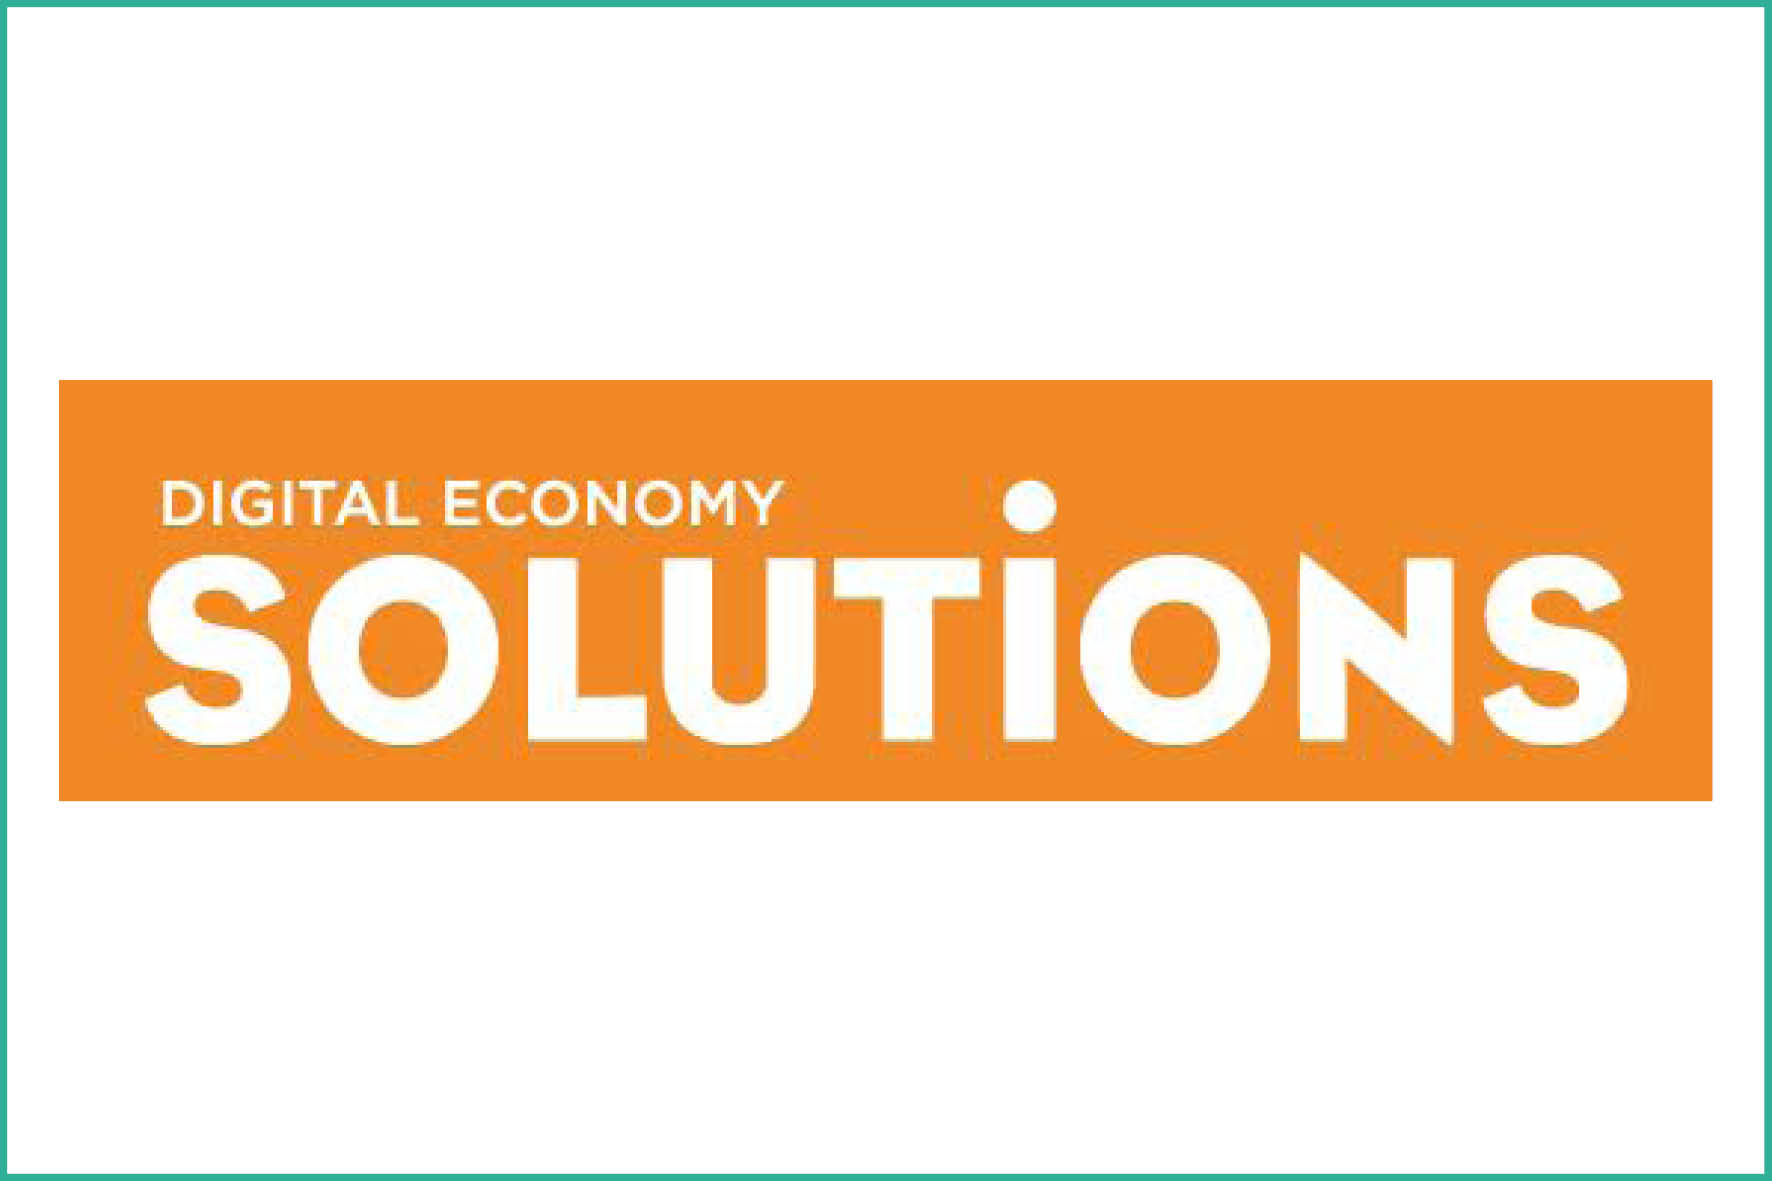 bcc-digital-economy-solutions